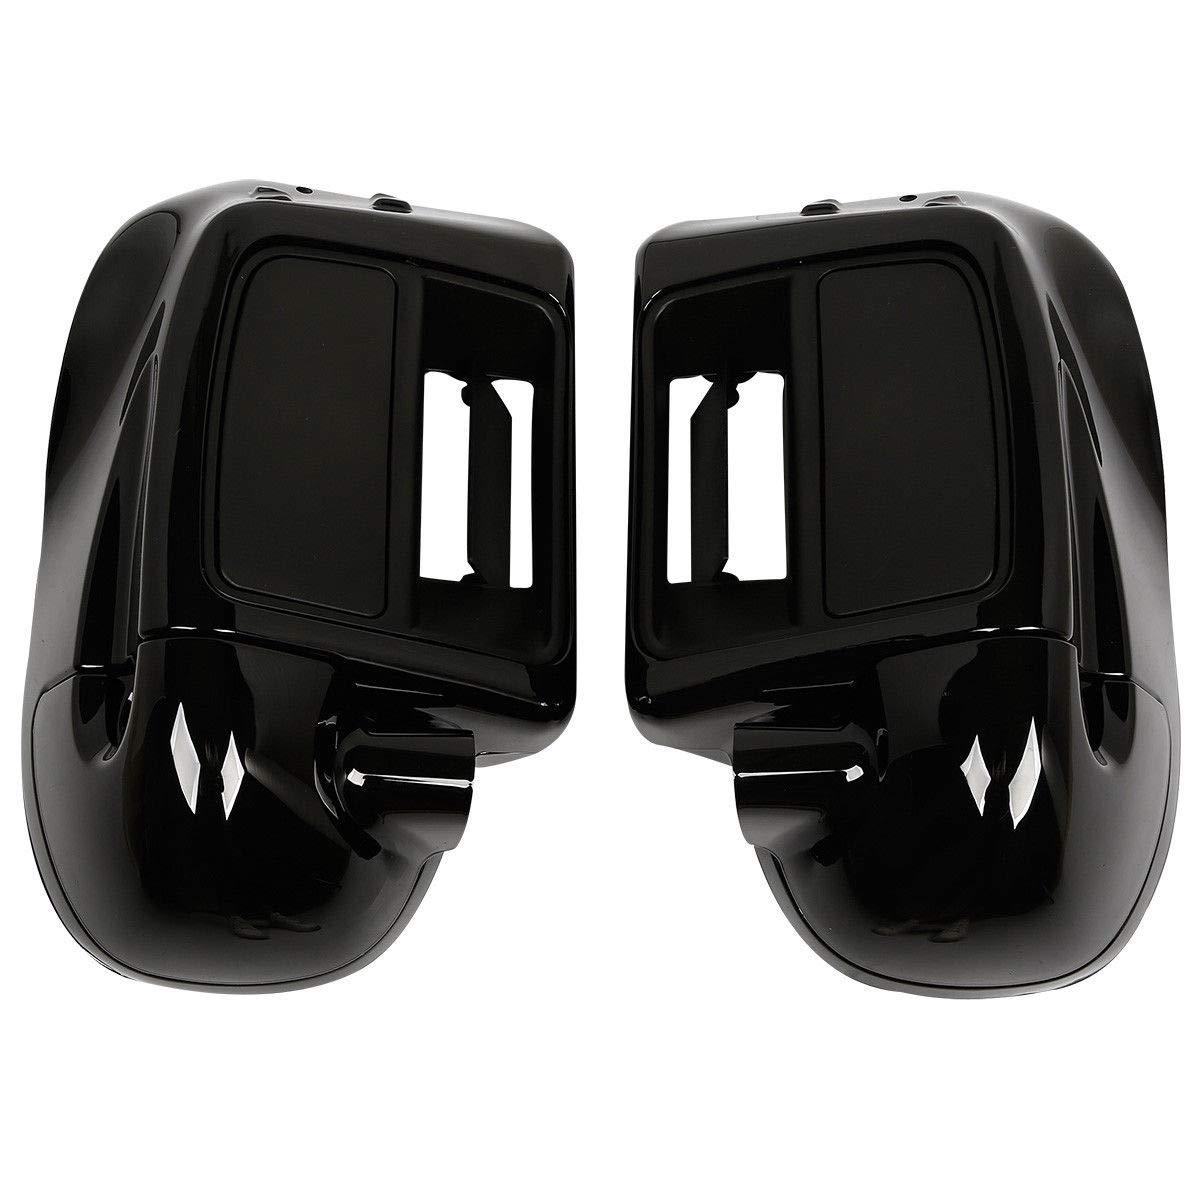 TCT-MT 6.5 Speaker Box Lower Vented Fairing For Harley Touring Road King Electra Street Glide FLHX 2014-2018 Vivid Black